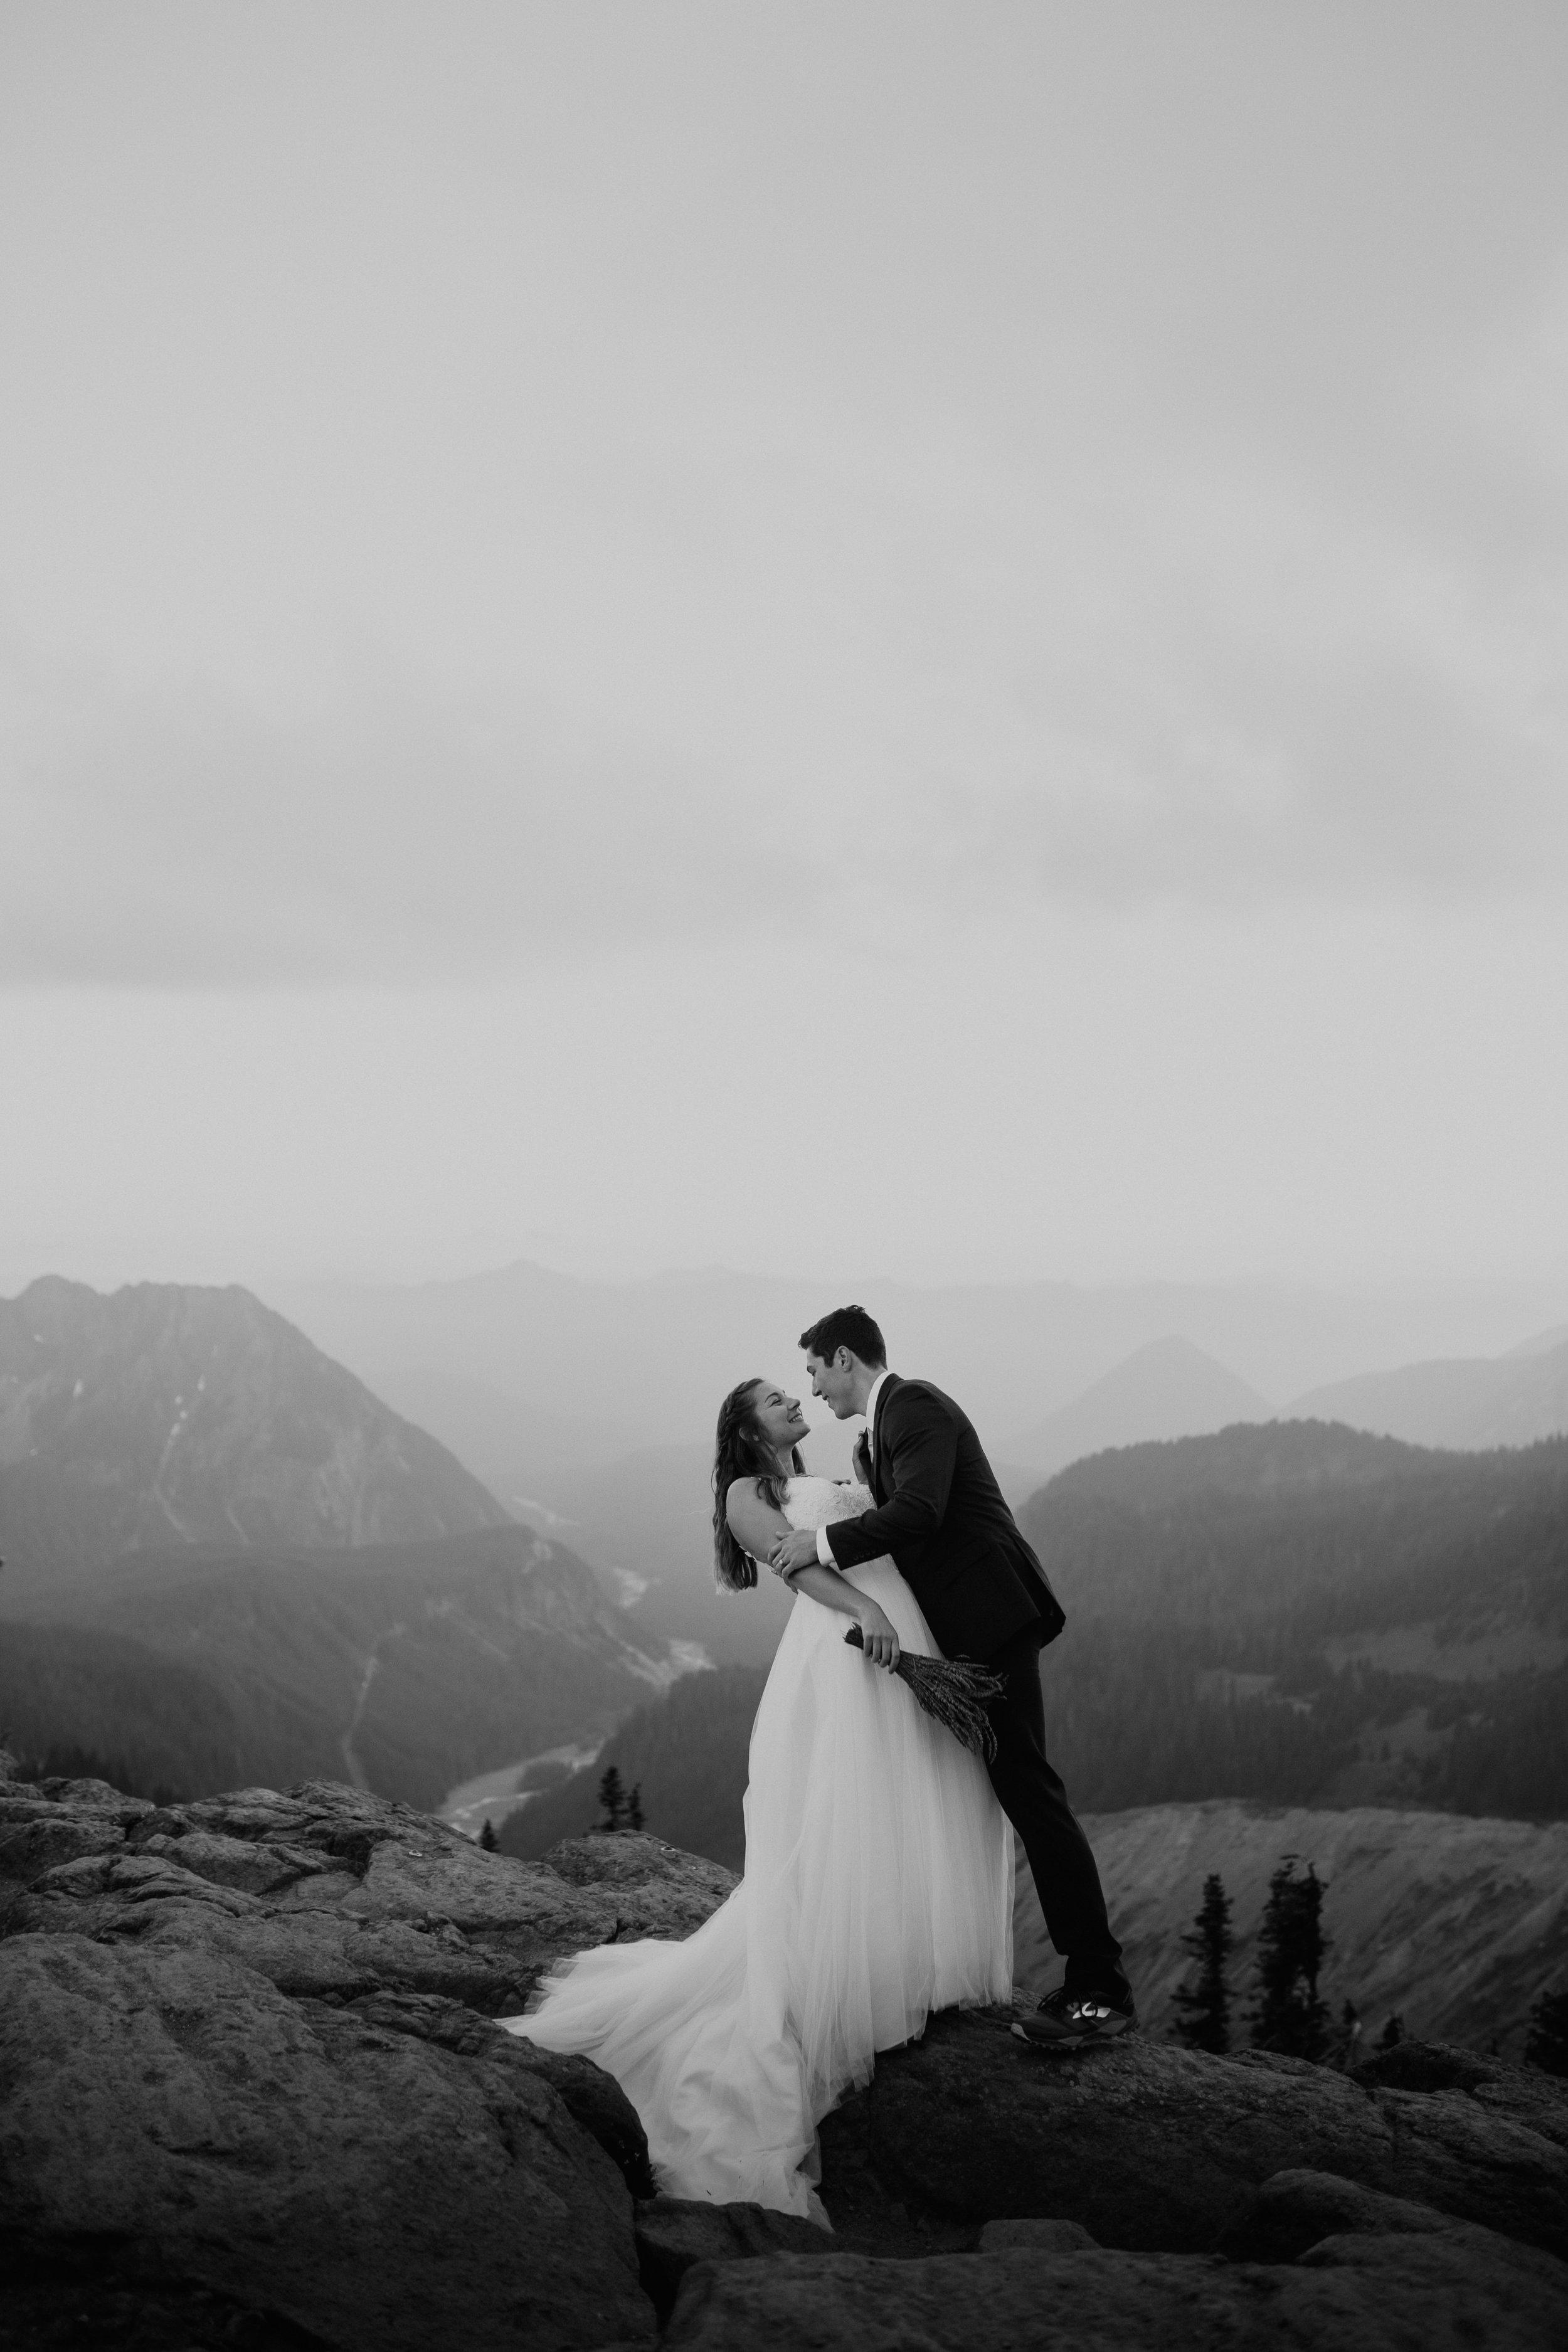 Nicole-Daacke-Photography-Mt-Rainier-elopement-photographer-washington-mountain-epic-wedding-photography-wildflowers-at-rainier-pine-tree-cloudy-summer-day-at-mountain-rainier-55.jpg